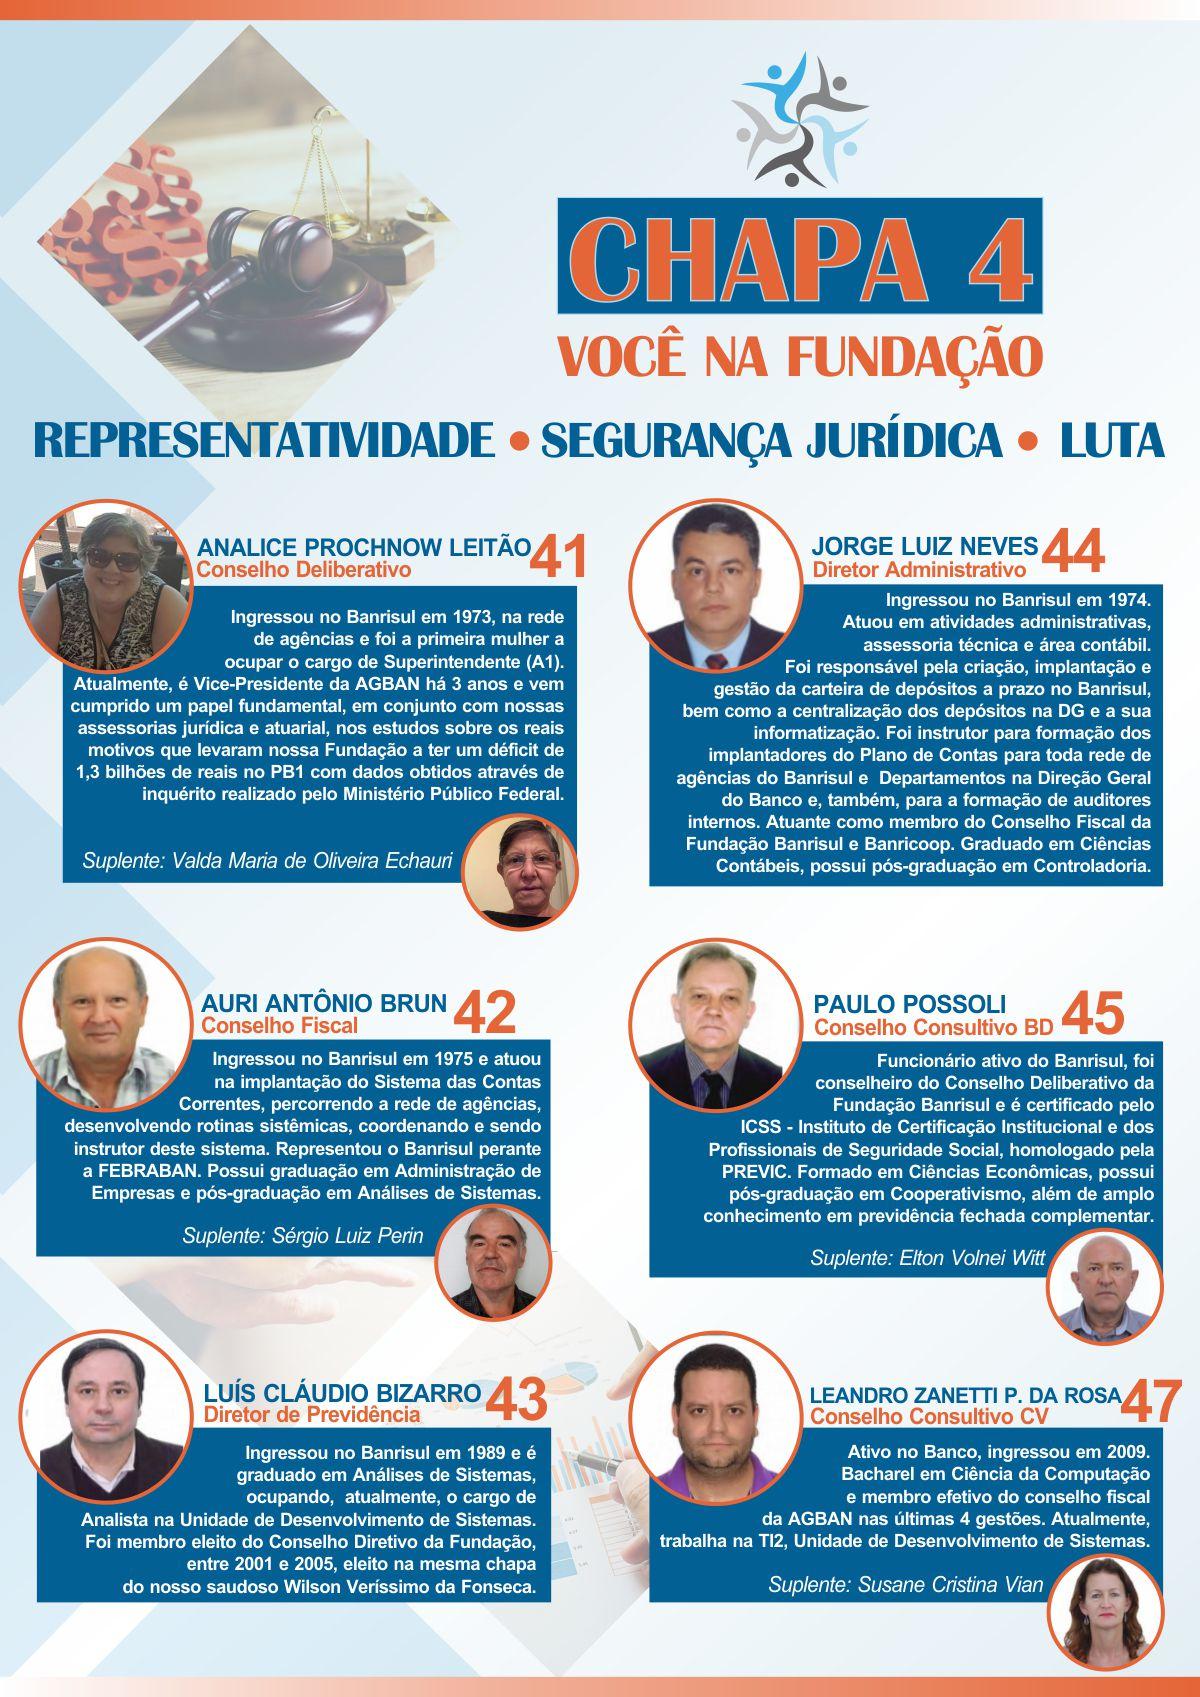 Chapa 4: Nossos candidatos